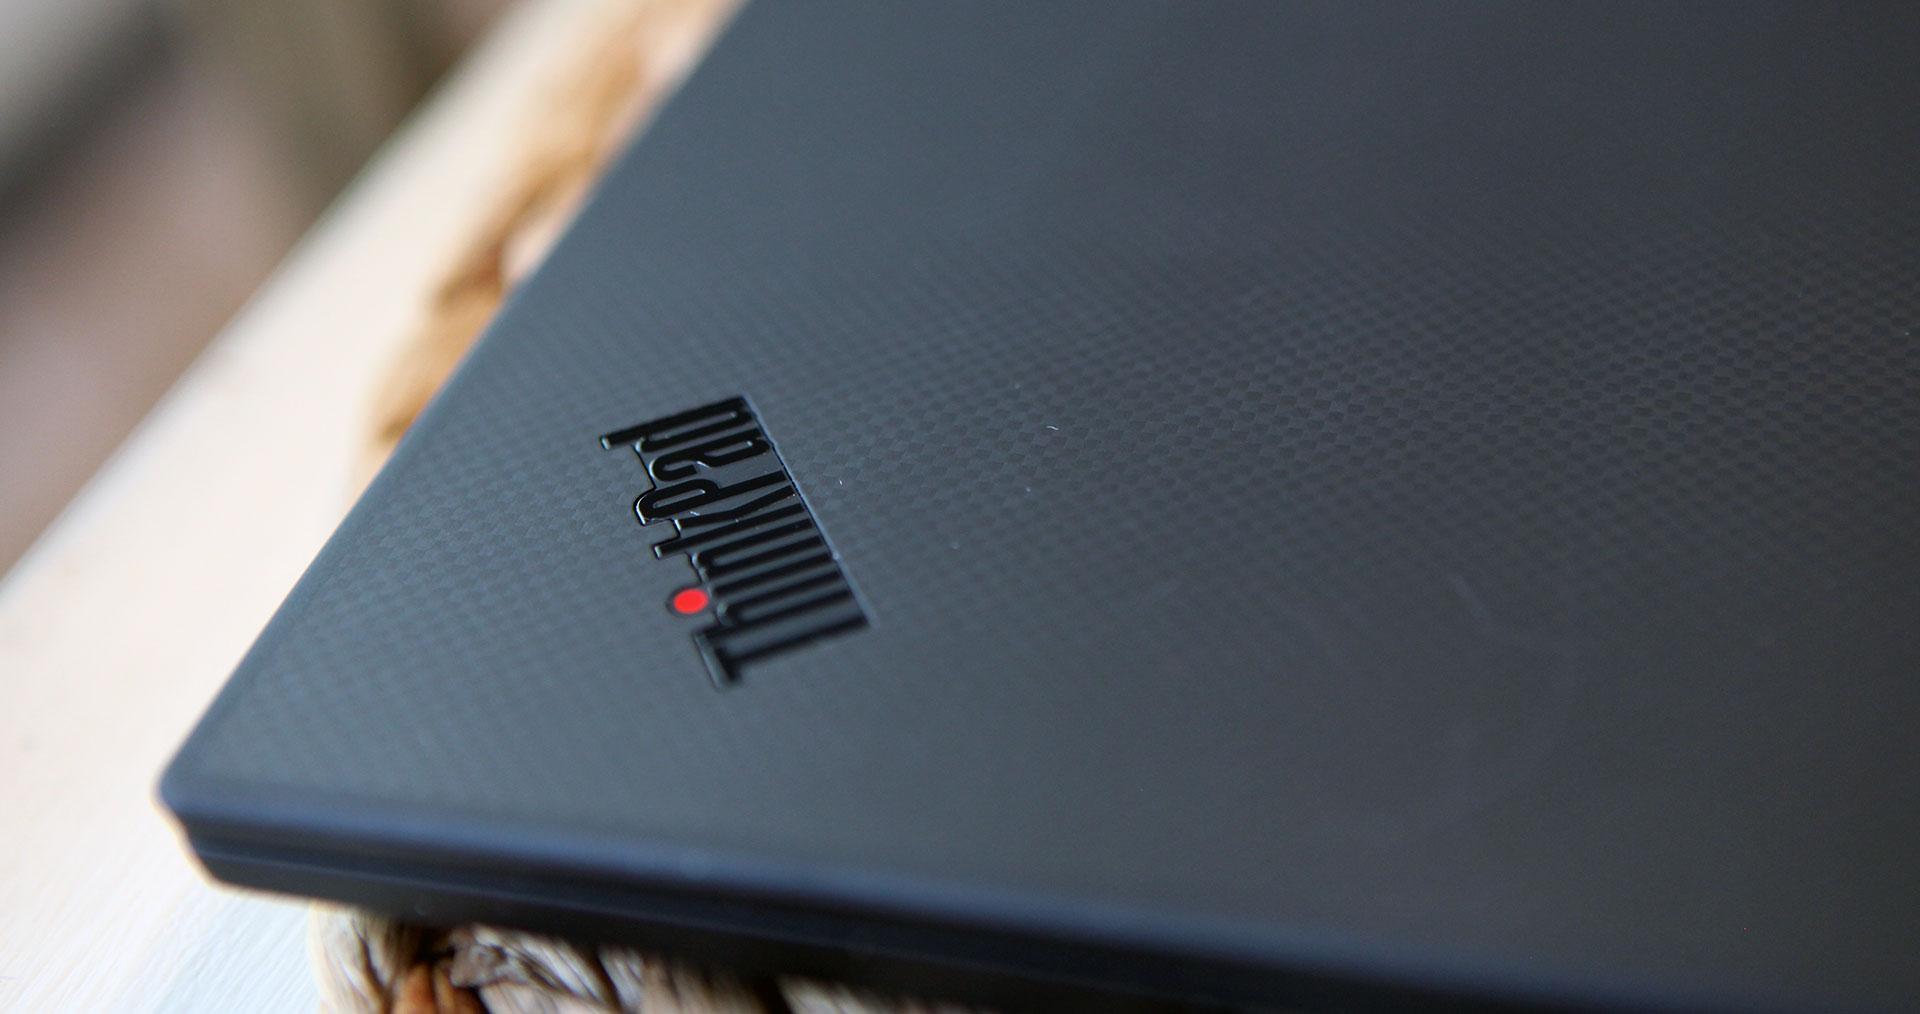 Lenovo ThinkPad X1 Carbon 7th gen review (2019 model - Core